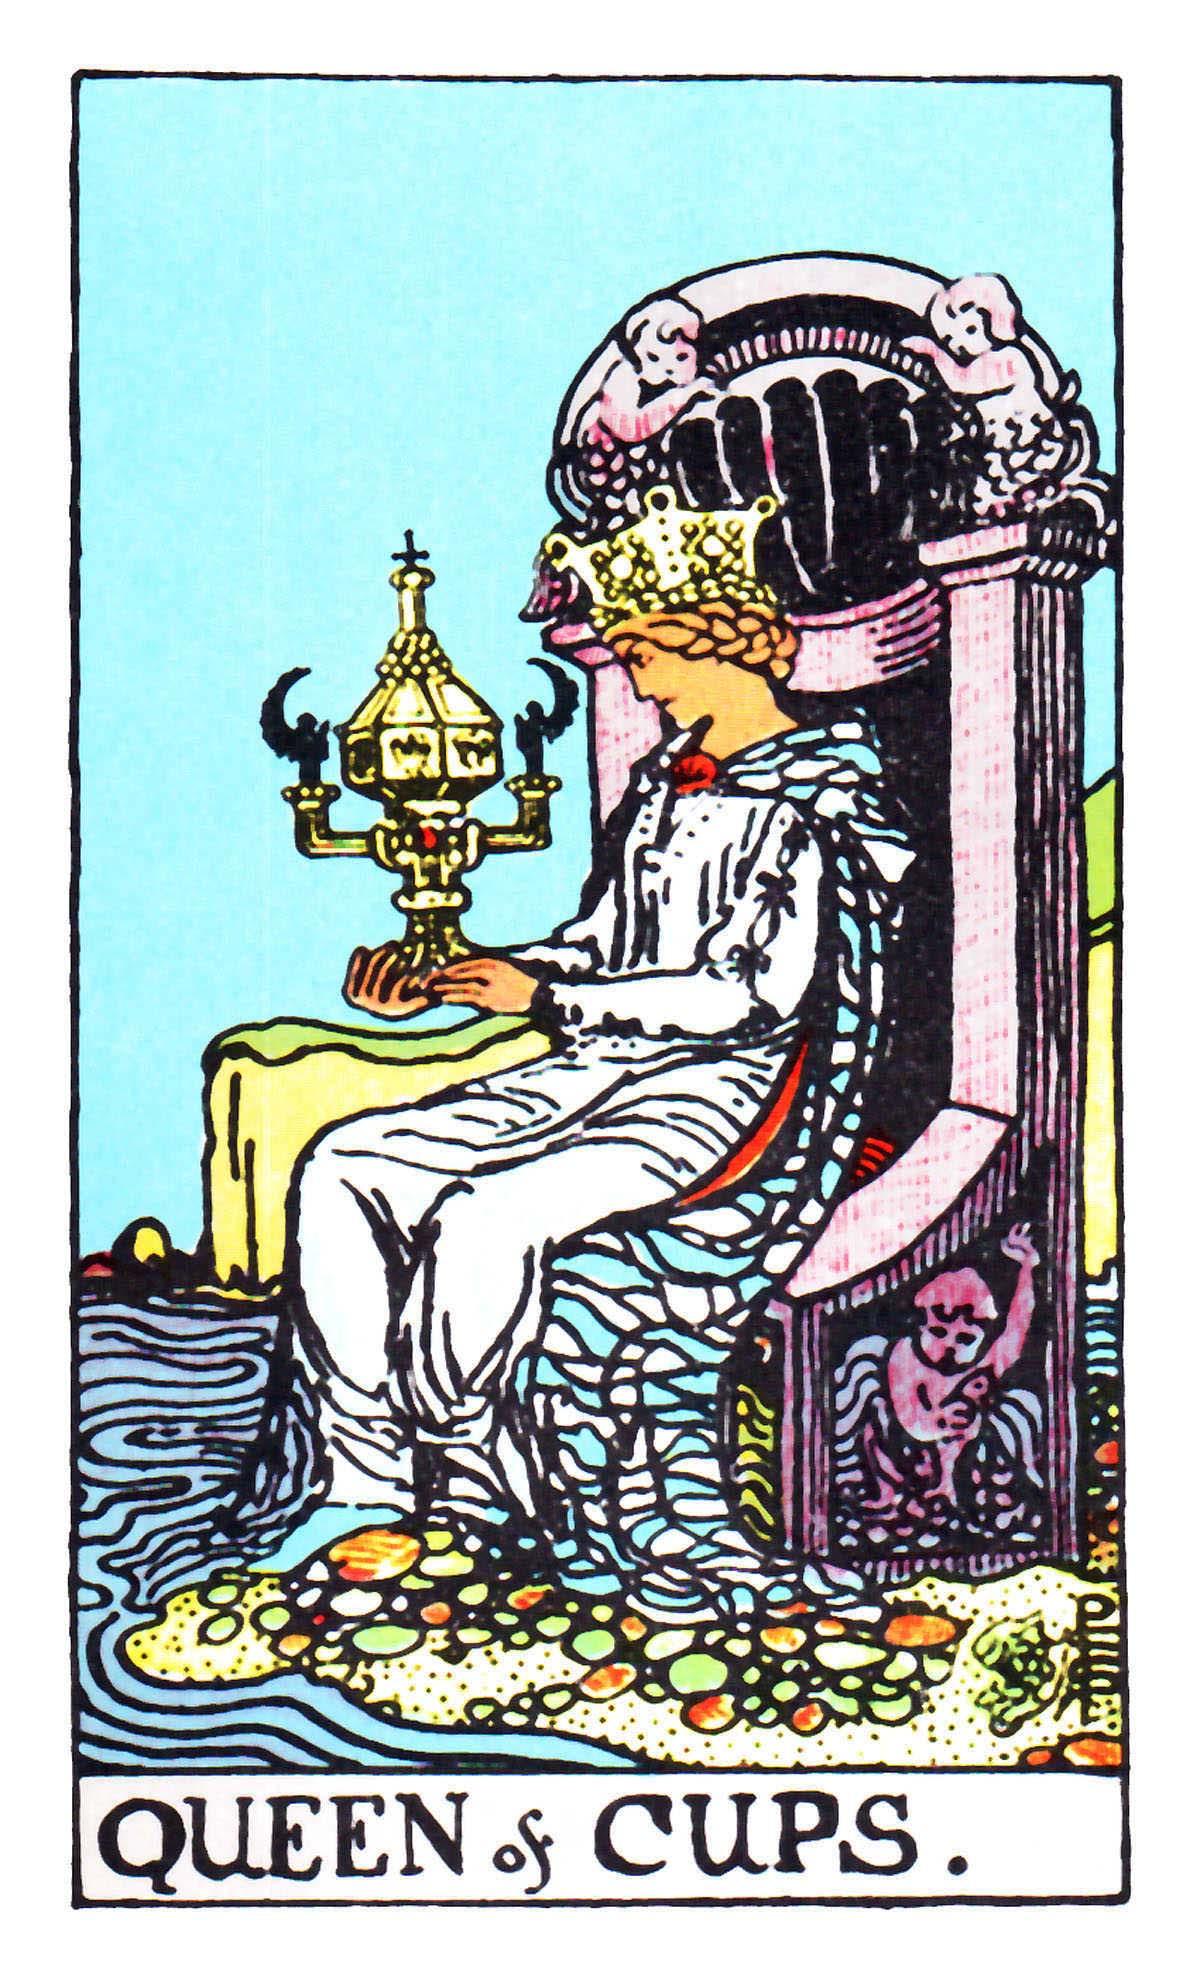 聖杯皇后 Queen of Cups 塔羅牌牌意